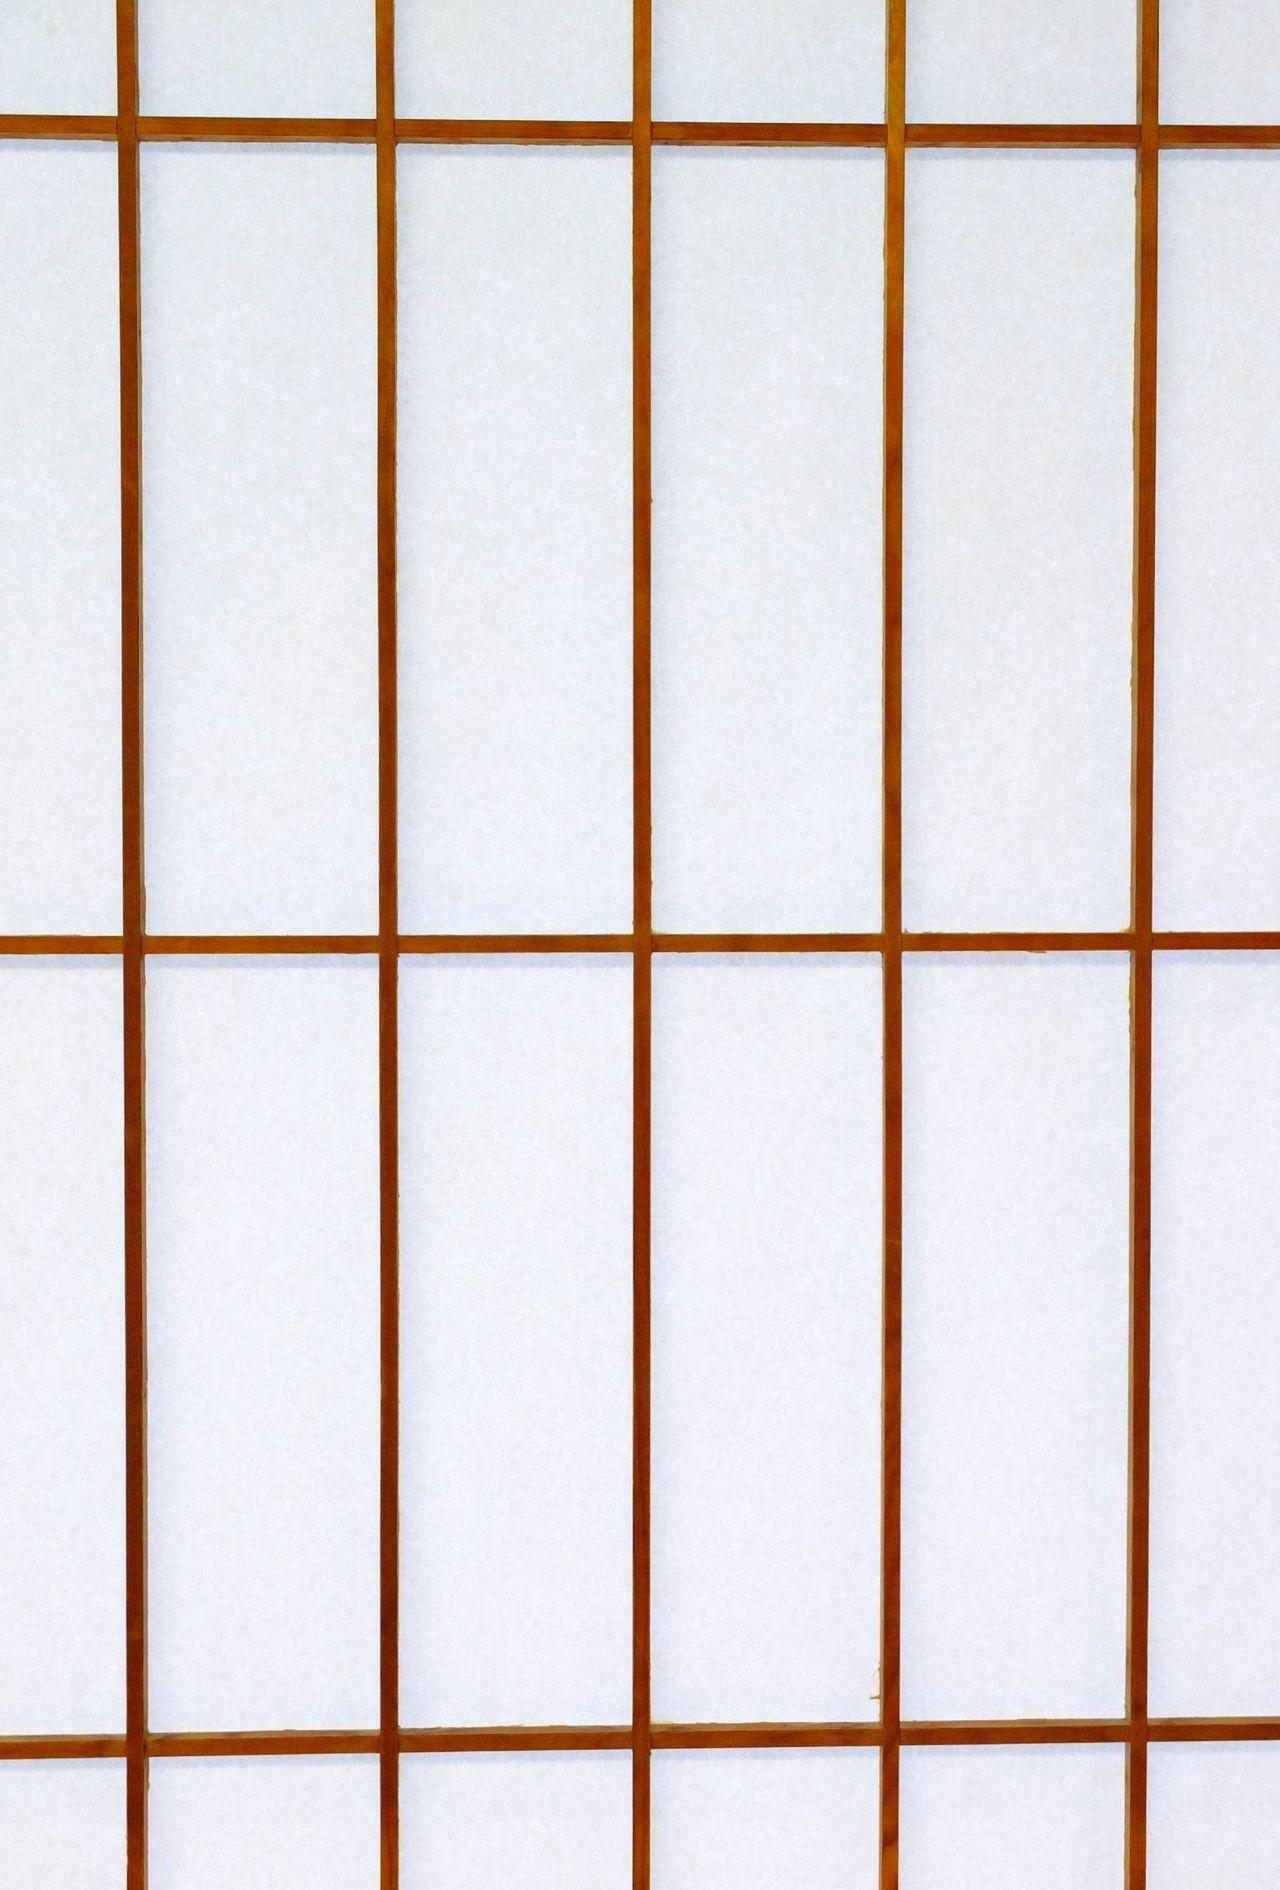 Shoji sliding door from Japan. Paper panel and wooden frame. Architecture Architecture Backgrounds Day Door Frame Interior Interior Design Japan Japan Photography Japanese  Japanese Culture Japanese Style No People Paper Paper Panel Shoji Sliding Door Textured  Tohoku Traditional Wooden Zen